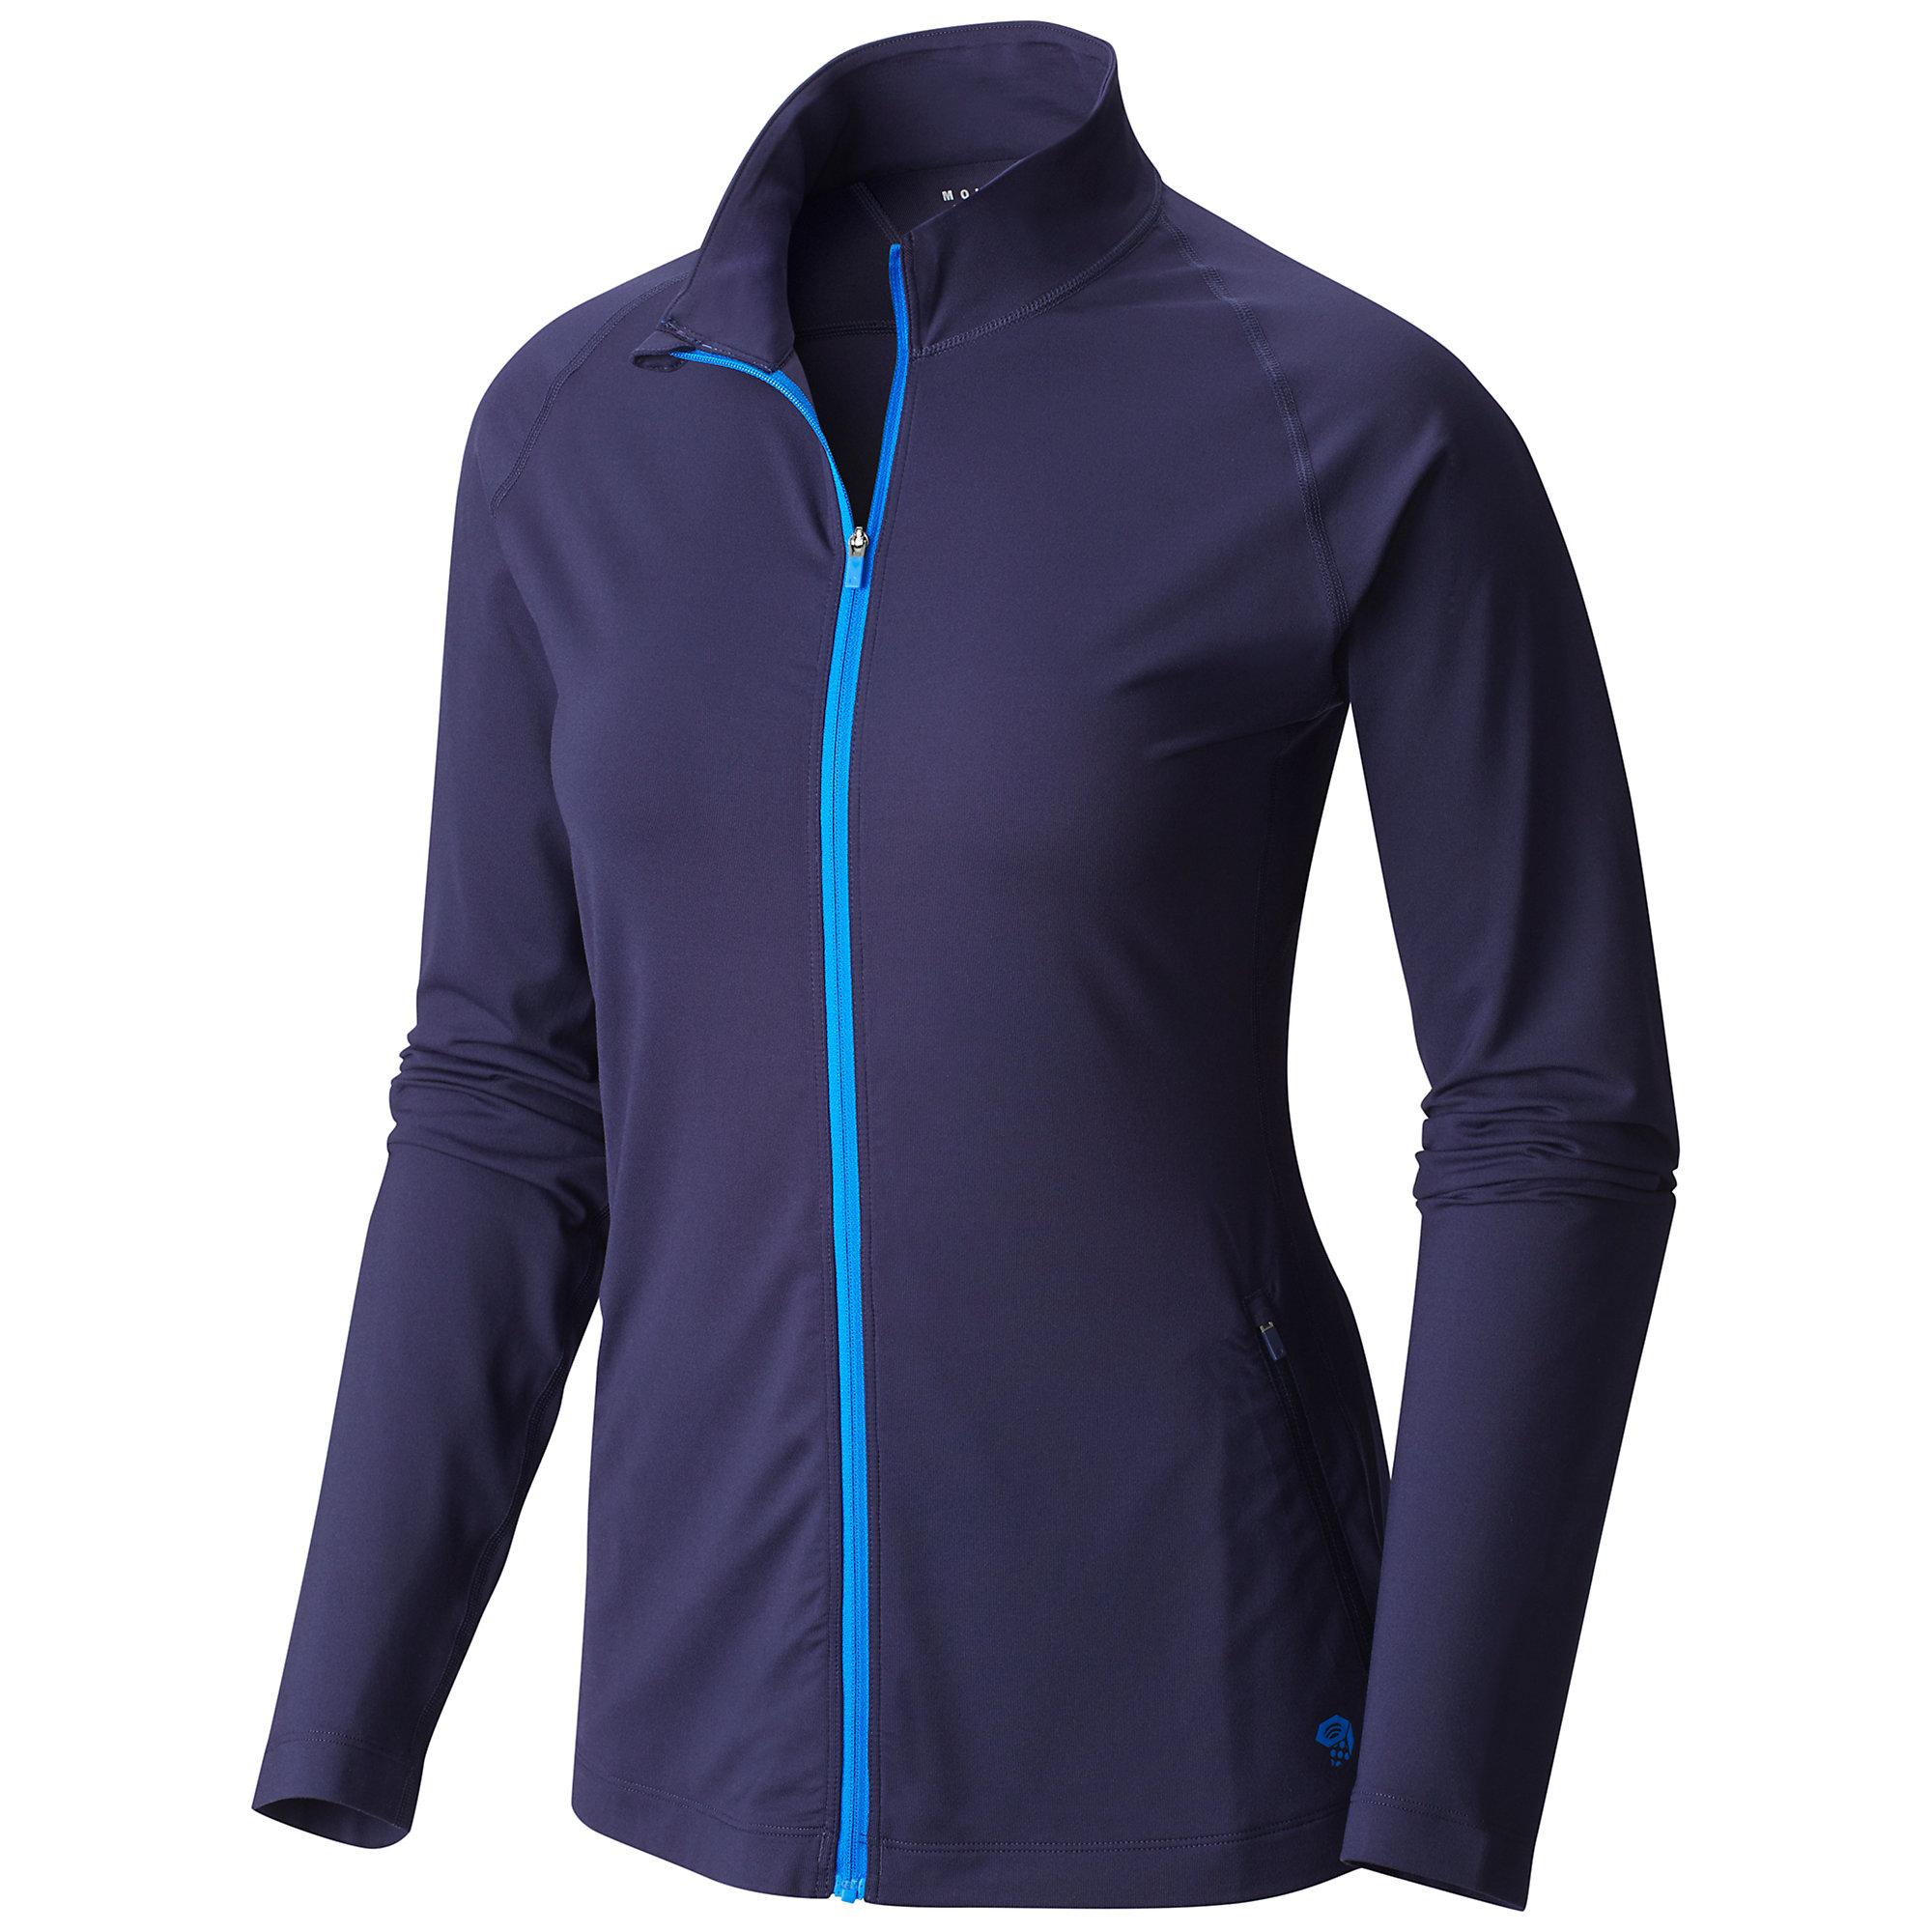 Mountain Hardwear Butterlicious Full Zip Jacket